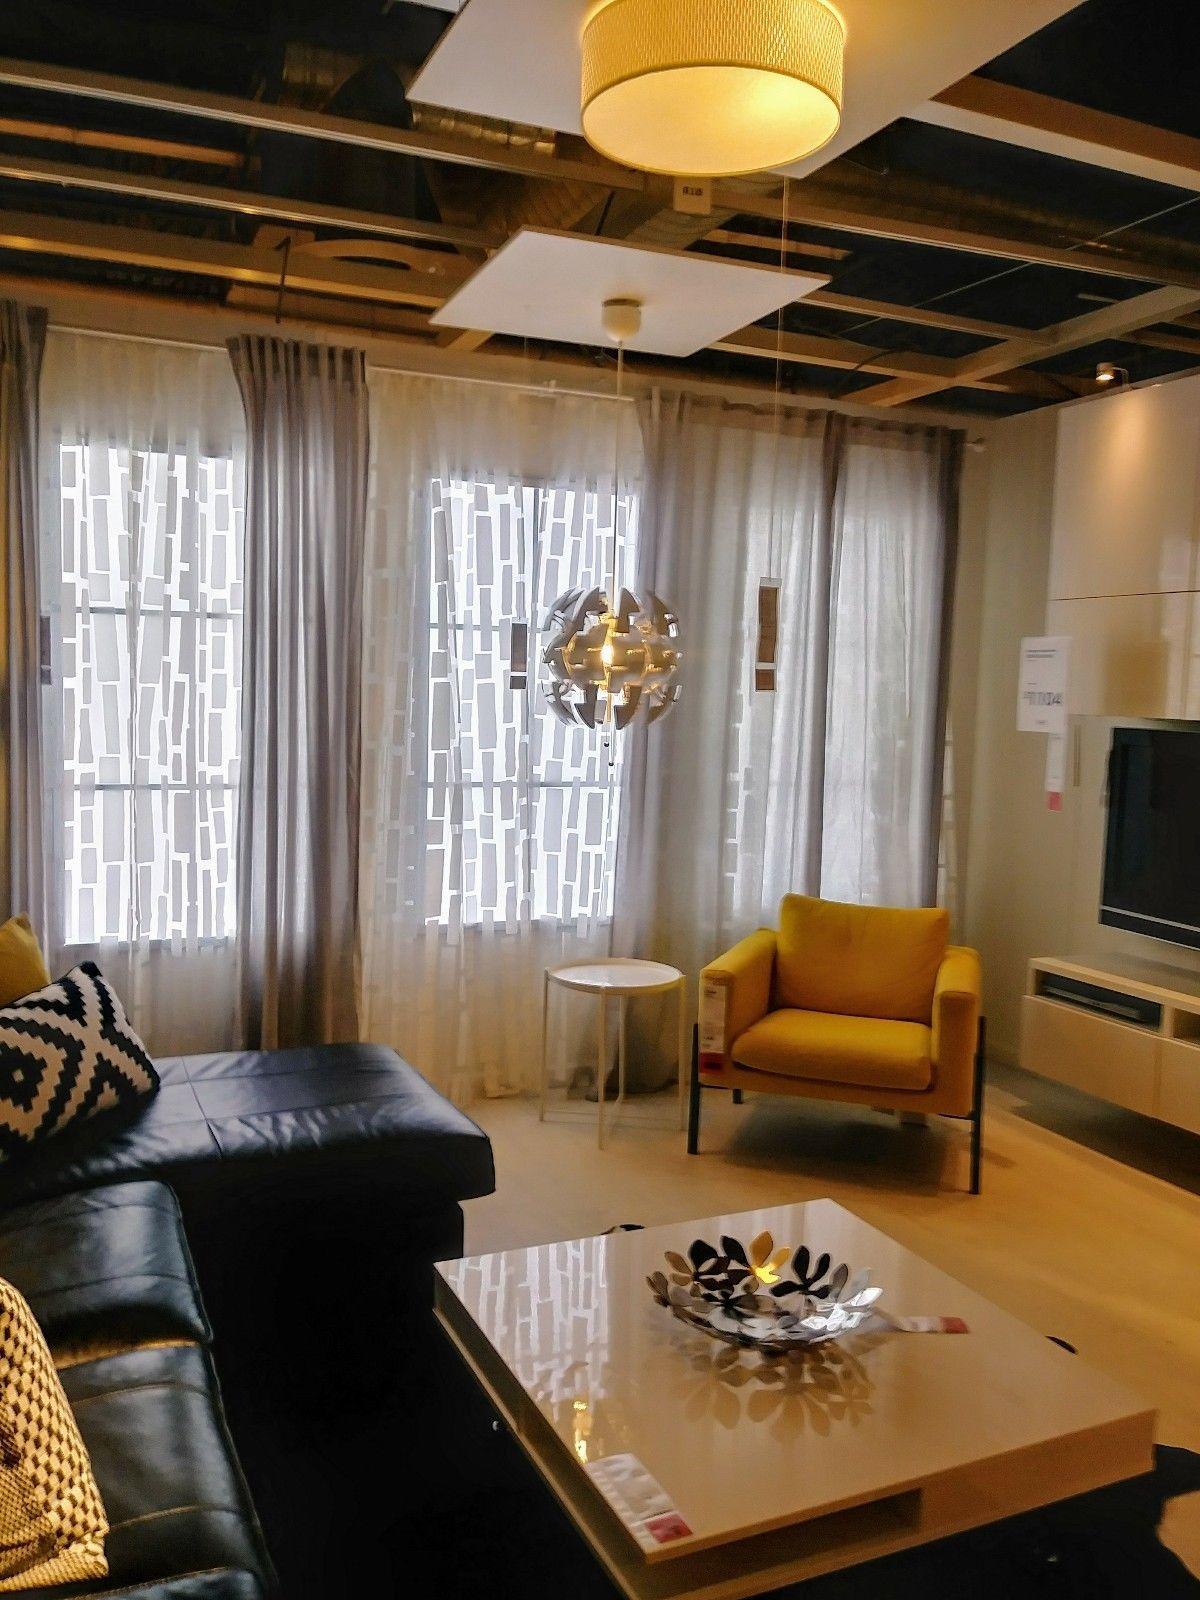 "IKEA PS 2014 FANTASTIC PENDANT LAMP 14 "" DIAMETER WHITE, COPPER COLOR"